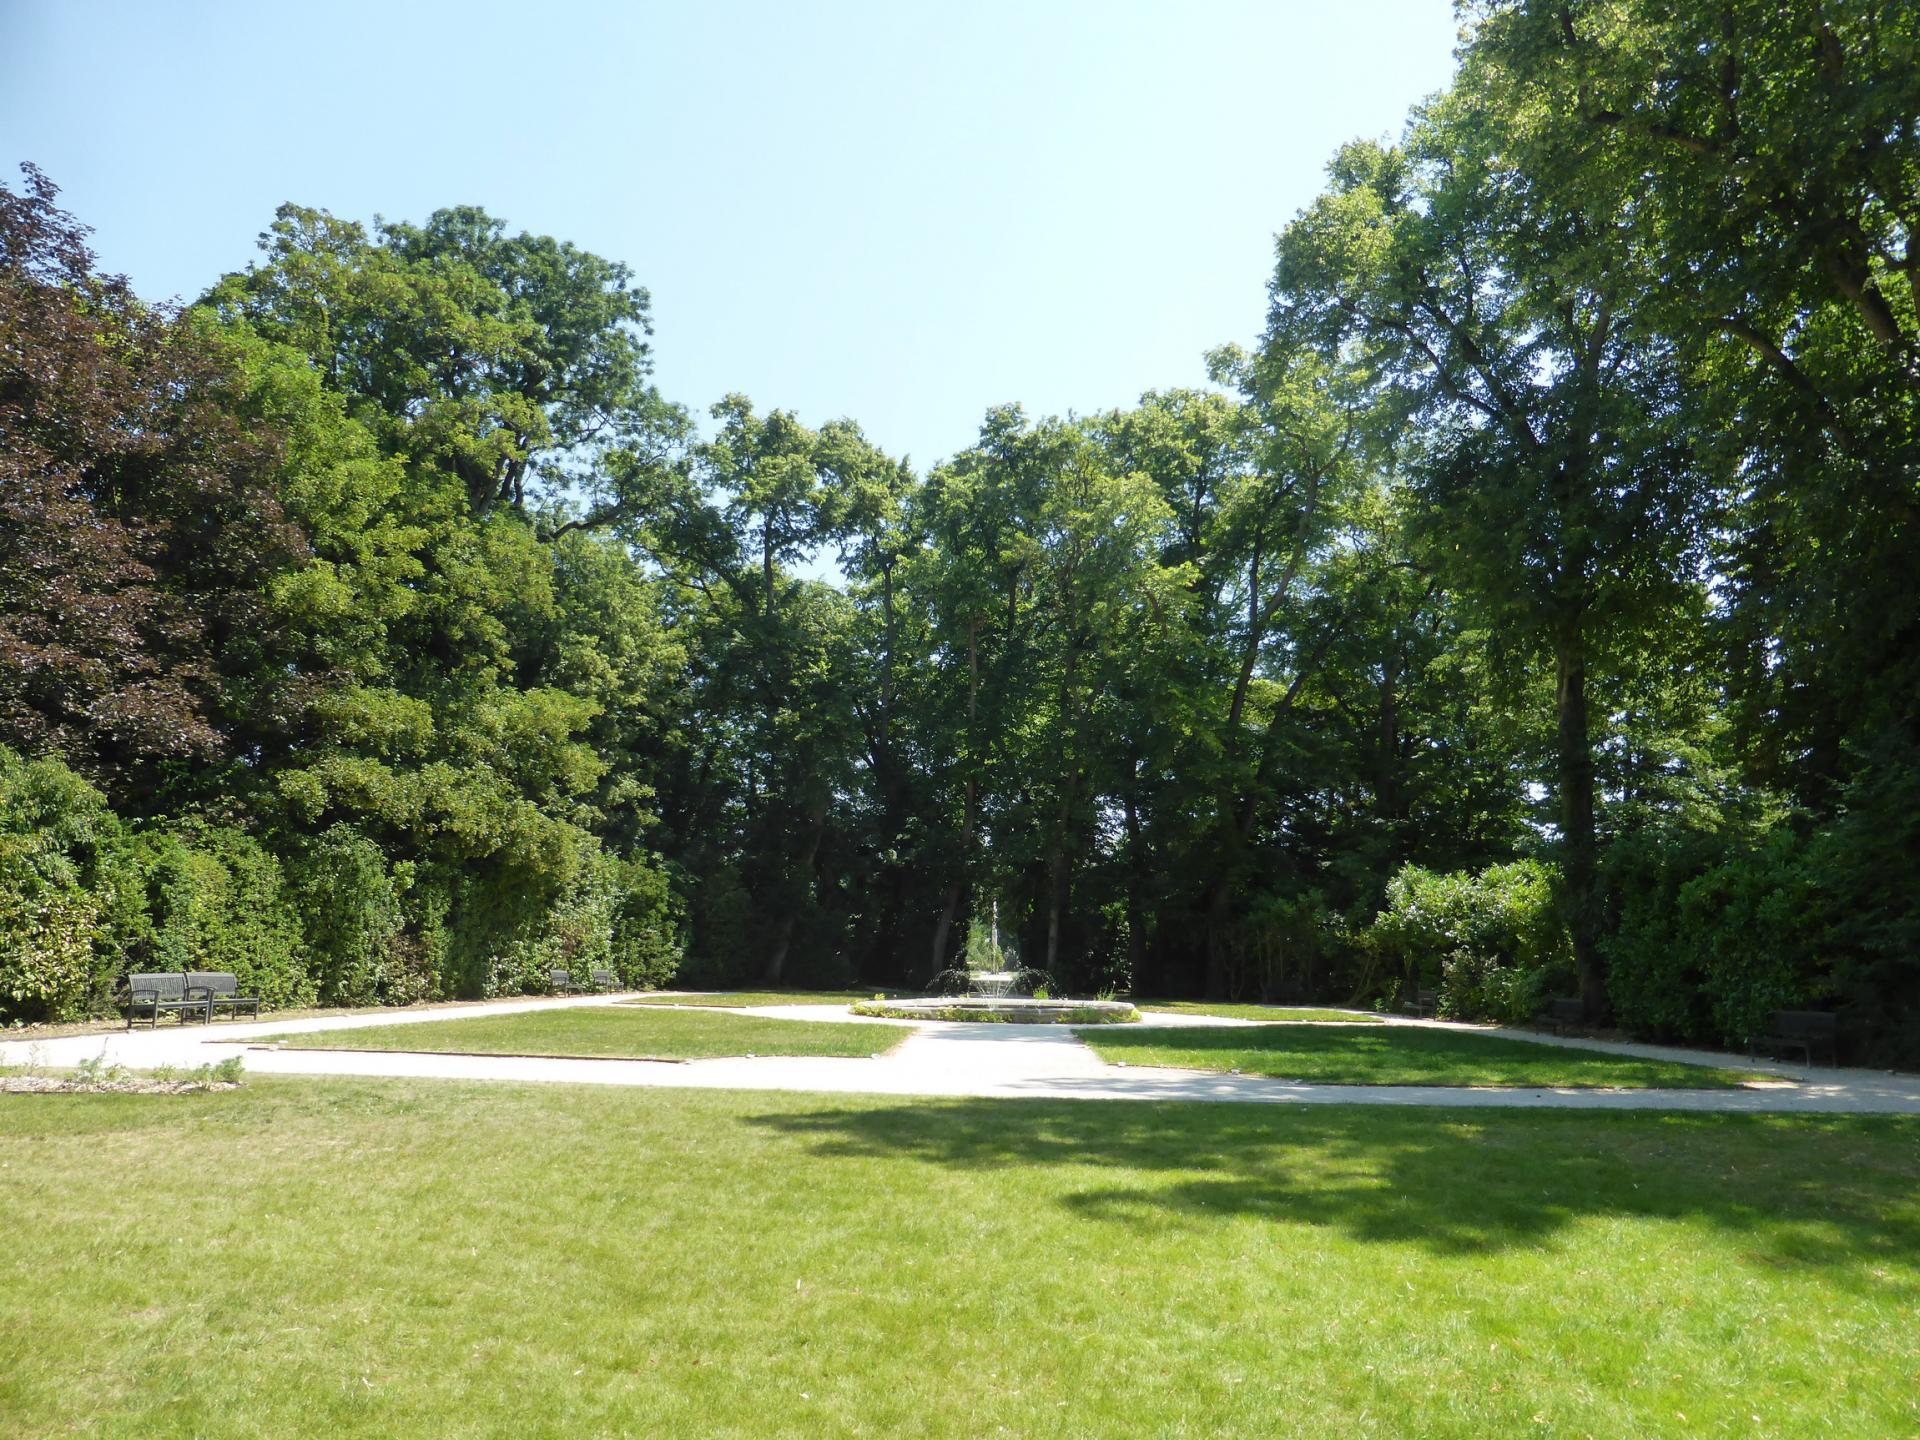 Le jardin XVIIIe restitué, cliché Philippe Cachau